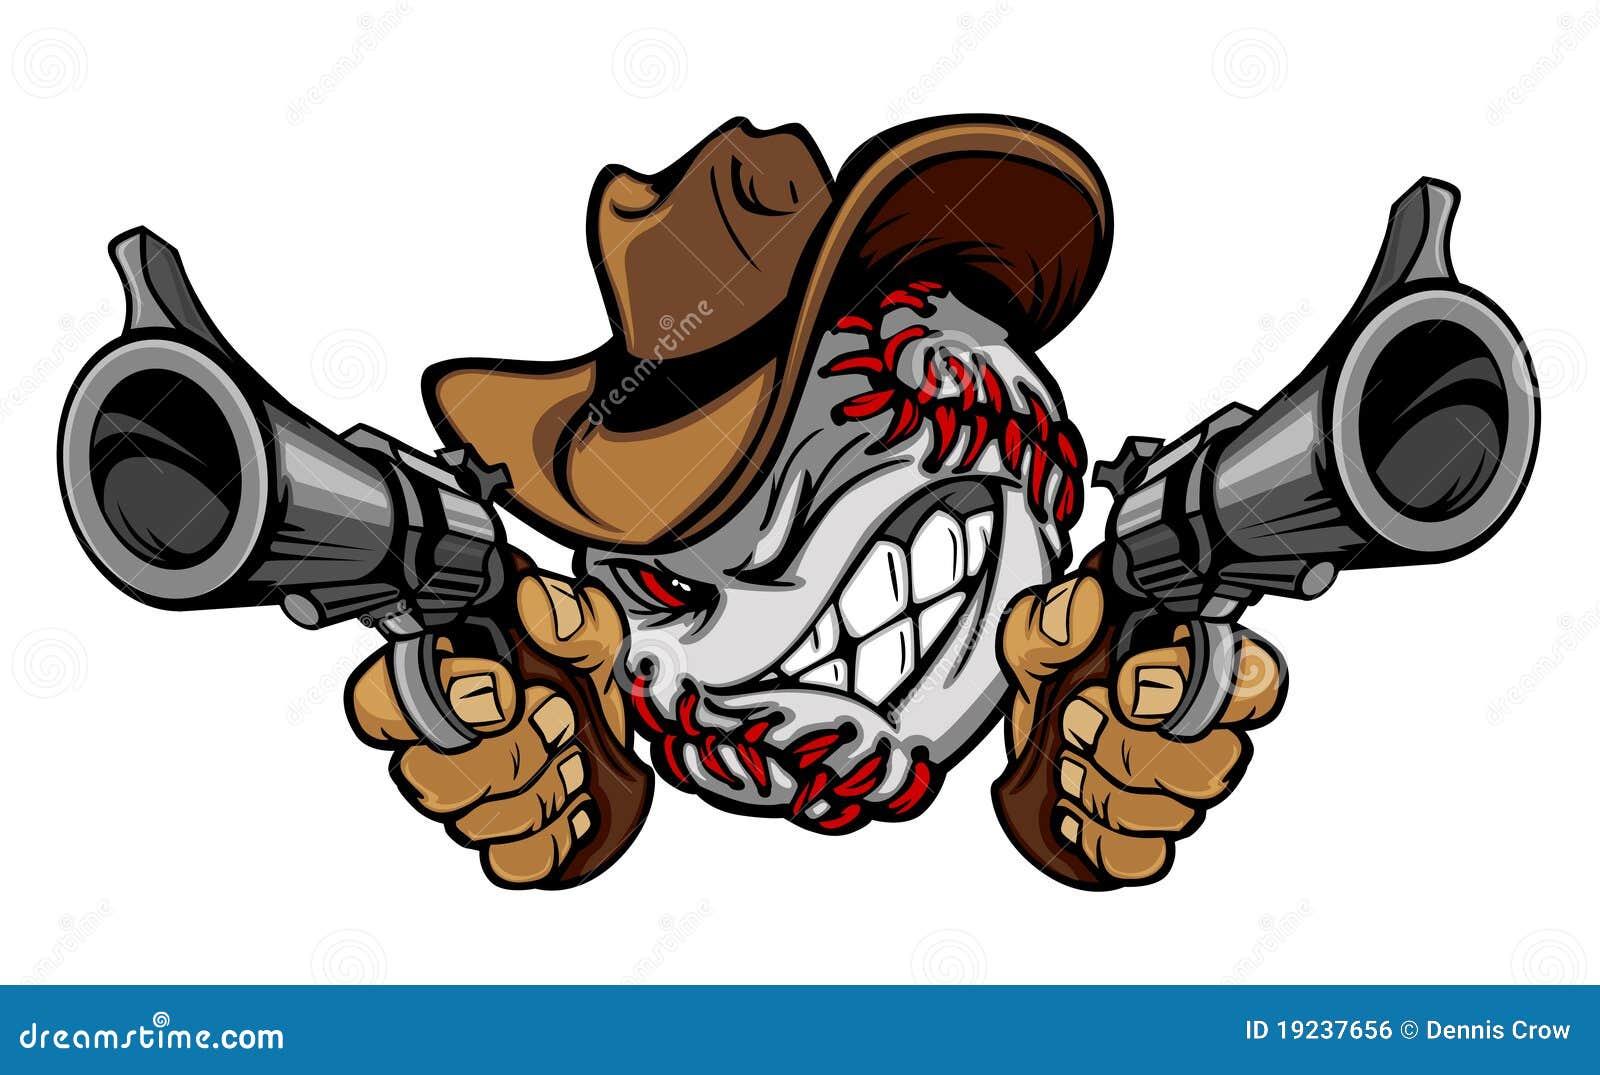 baseball cowboy illustration logo royalty free stock image Indian Motorcycle Logo Indian Motorcycle Logo